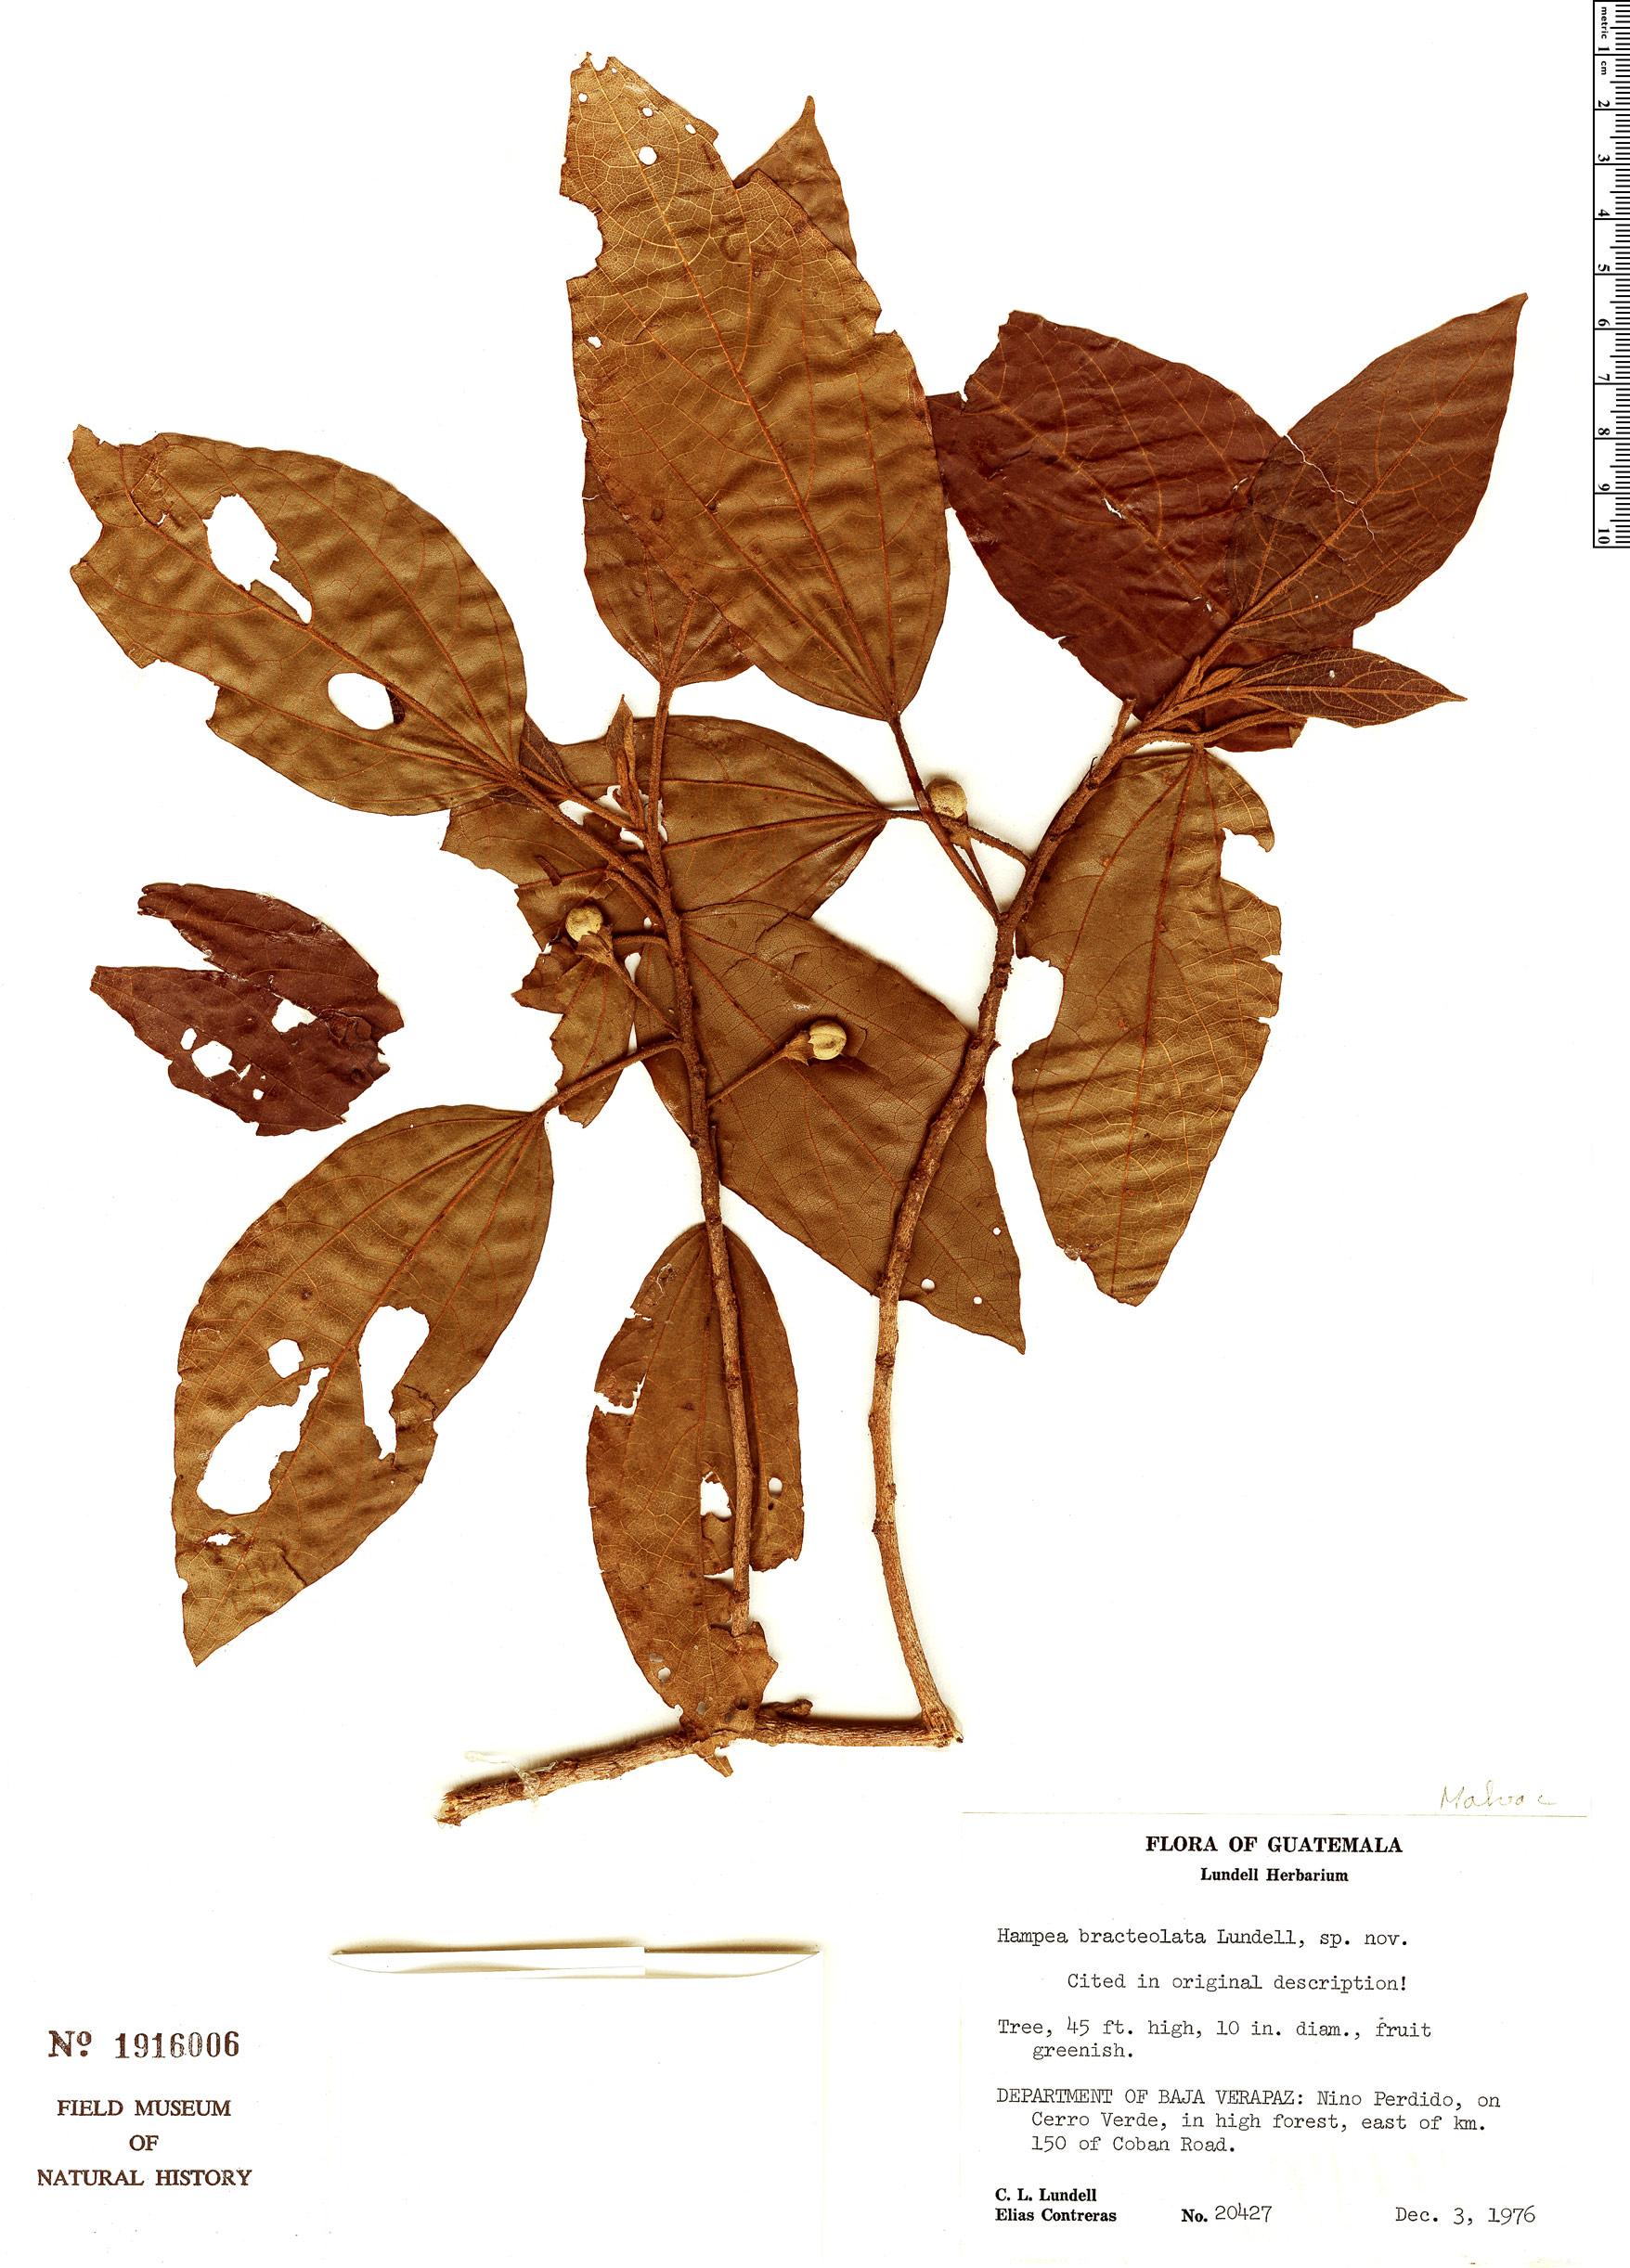 Specimen: Hampea bracteolata